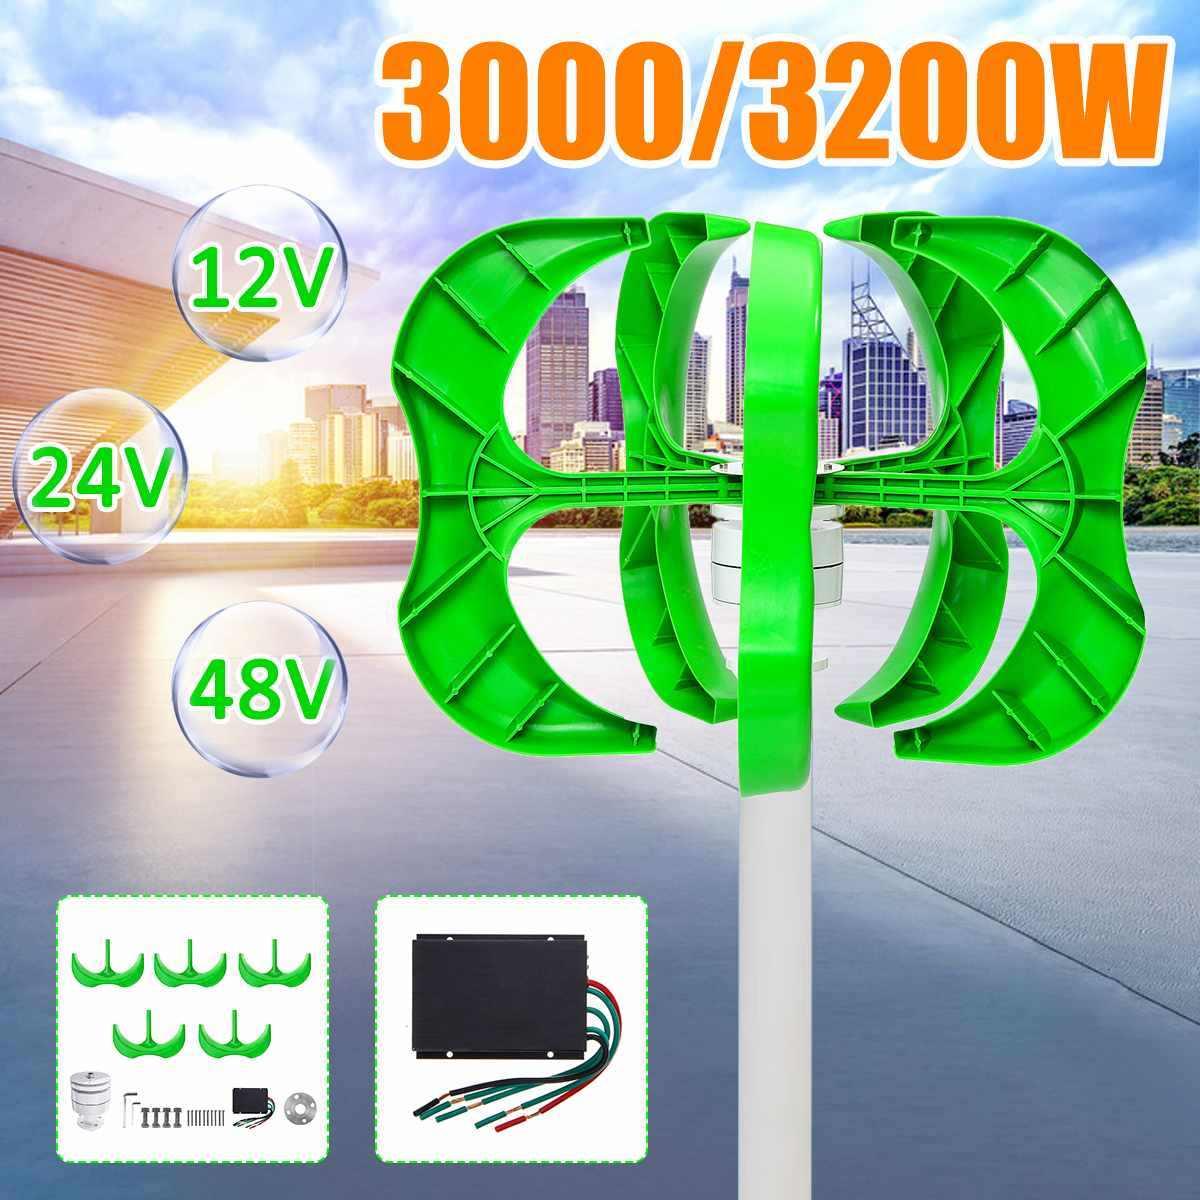 3200W/3000W Wind Generator 5 Blades generator 12/24/48V Lantern wind turbines Vertical Axis For Household Streetlight+Controller